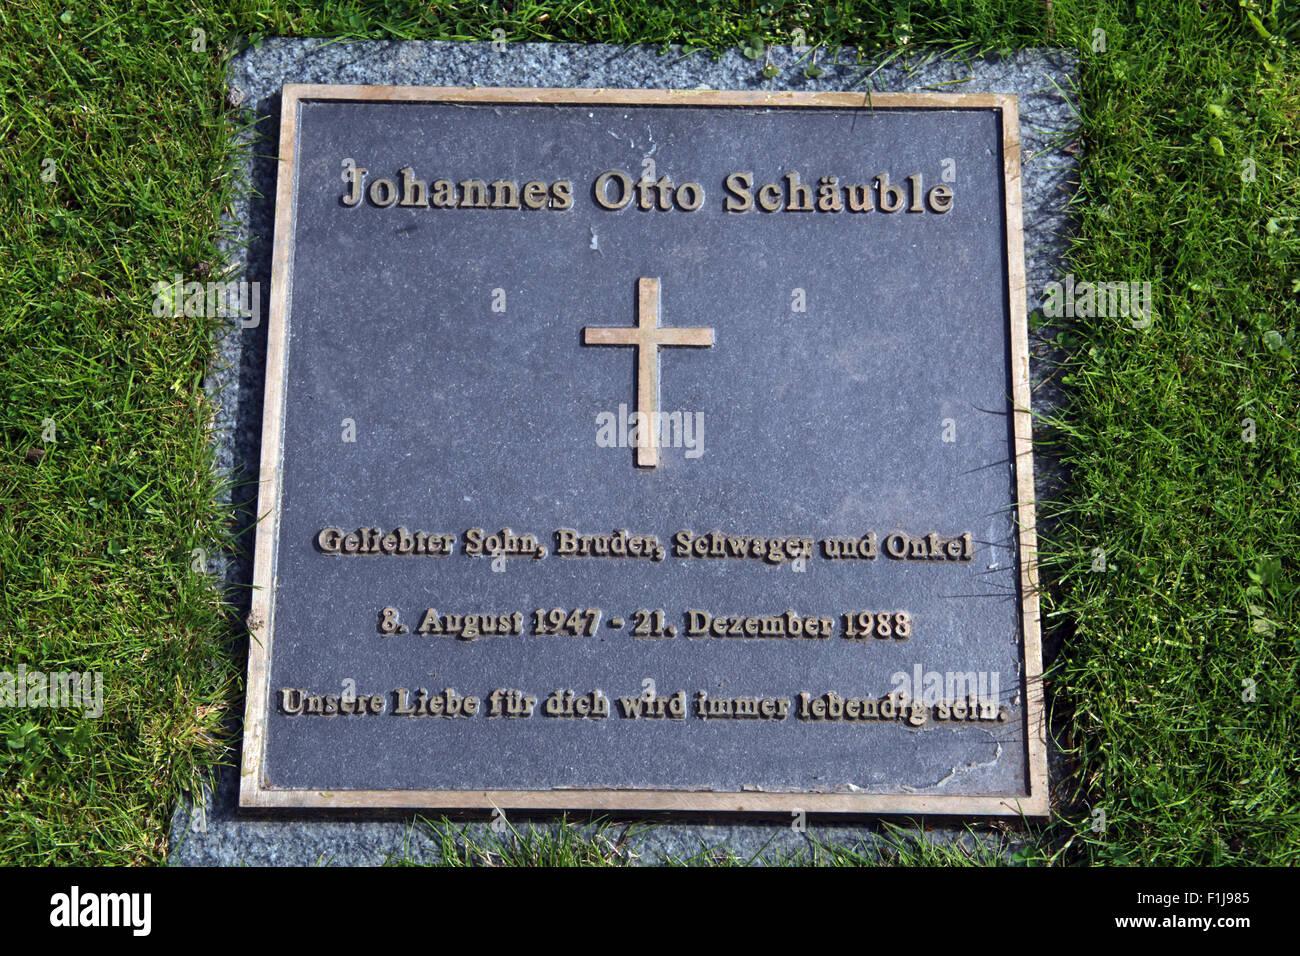 Lockerbie PanAm103 In Rememberance Memorial Johannes Otto Schauble,Scotland Stock Photo